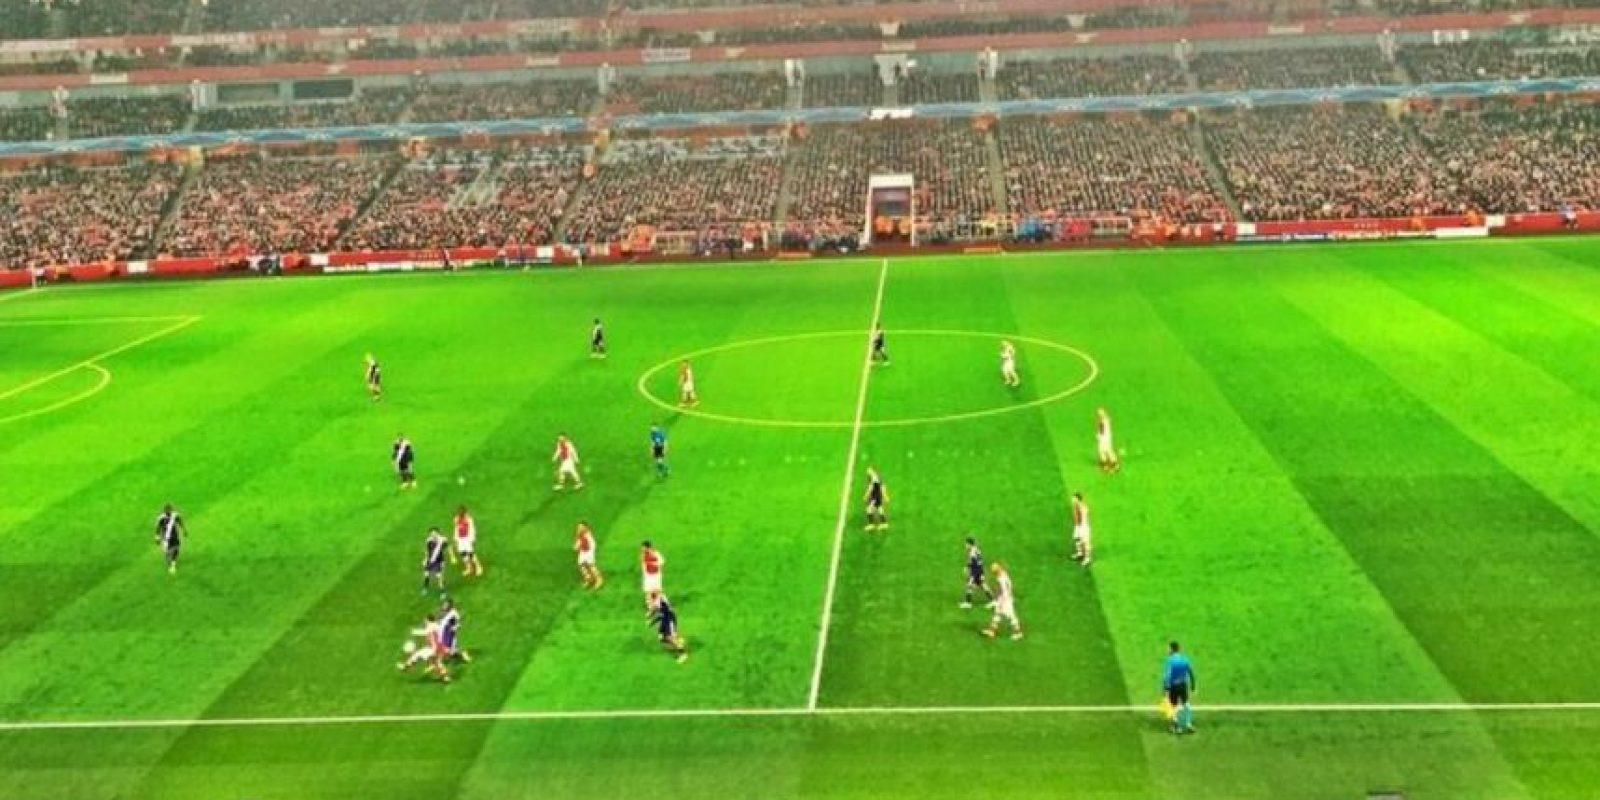 Roger también fue a ver al Arsenal en un partido de la UEFA Champions League. Foto:twitter.com/rogerfederer